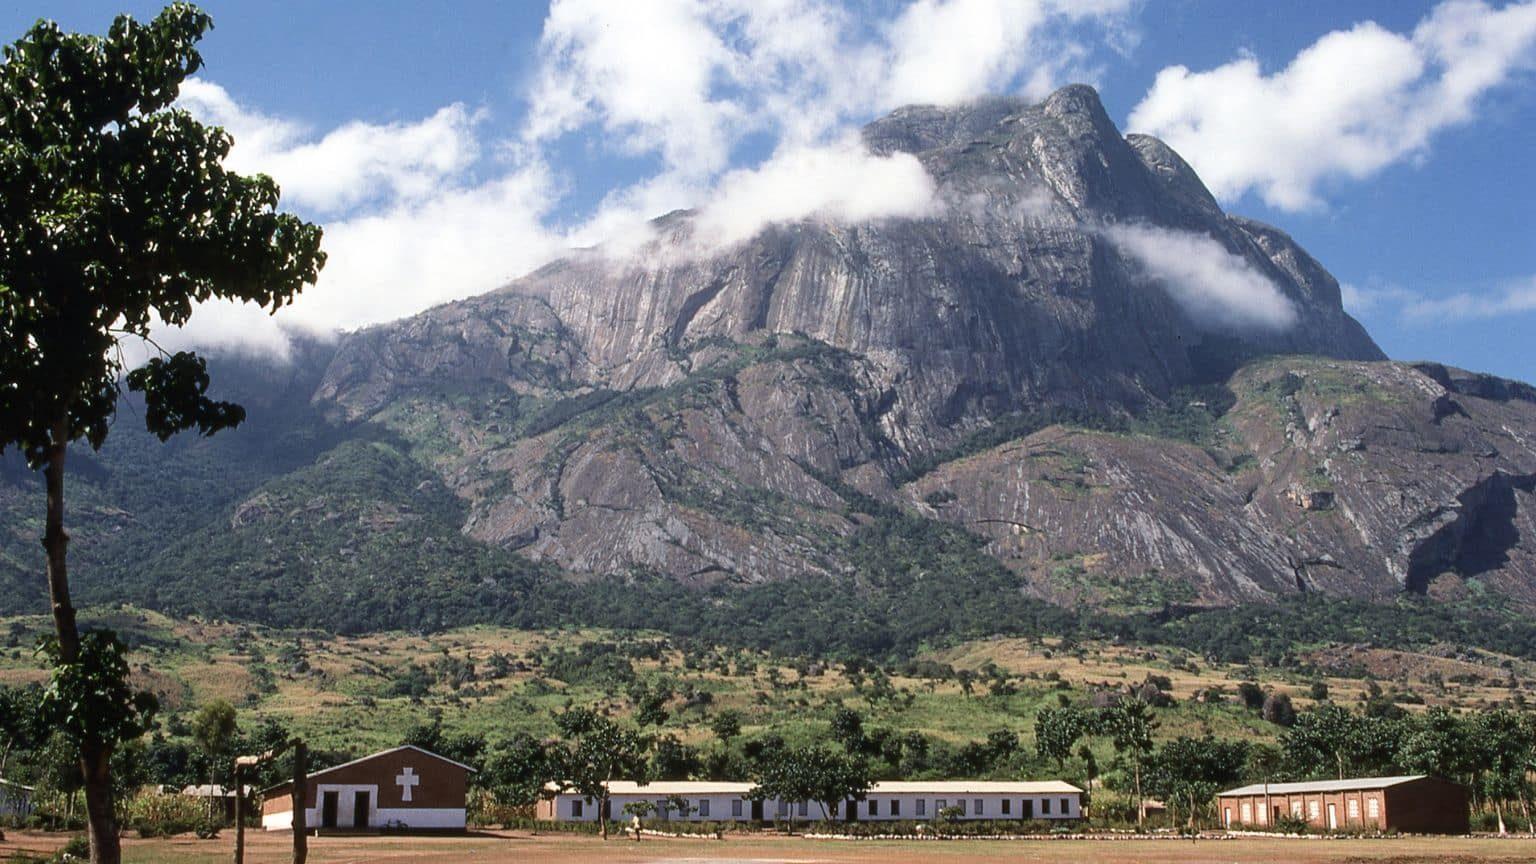 Rocky cliffs of Malawi